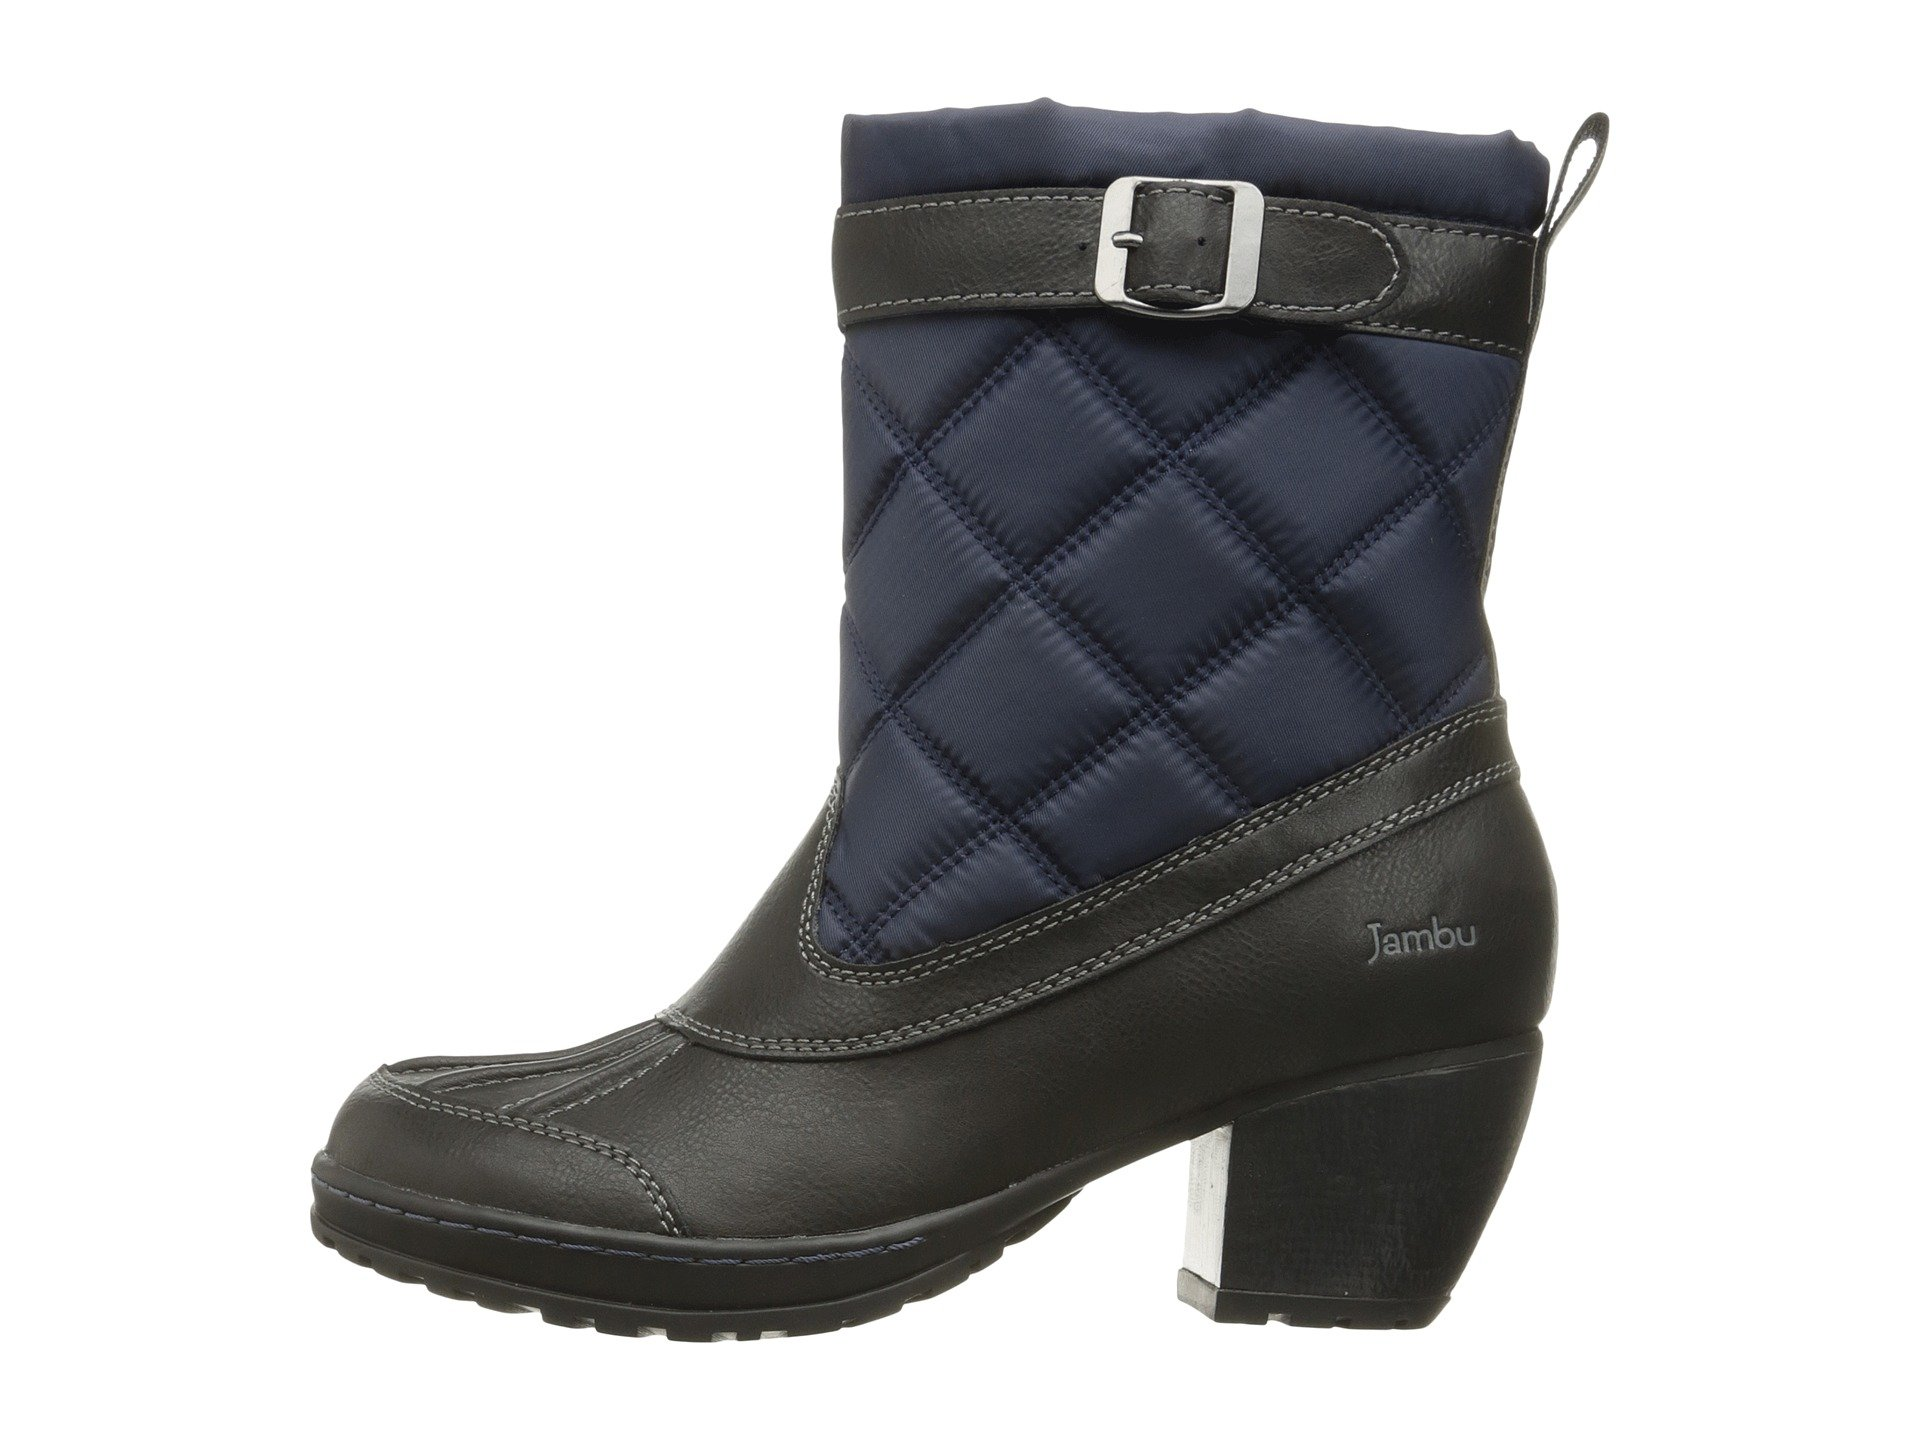 Jambu Women's Dover-Vegan Rain Boot, Navy/Black, 9.5 M US